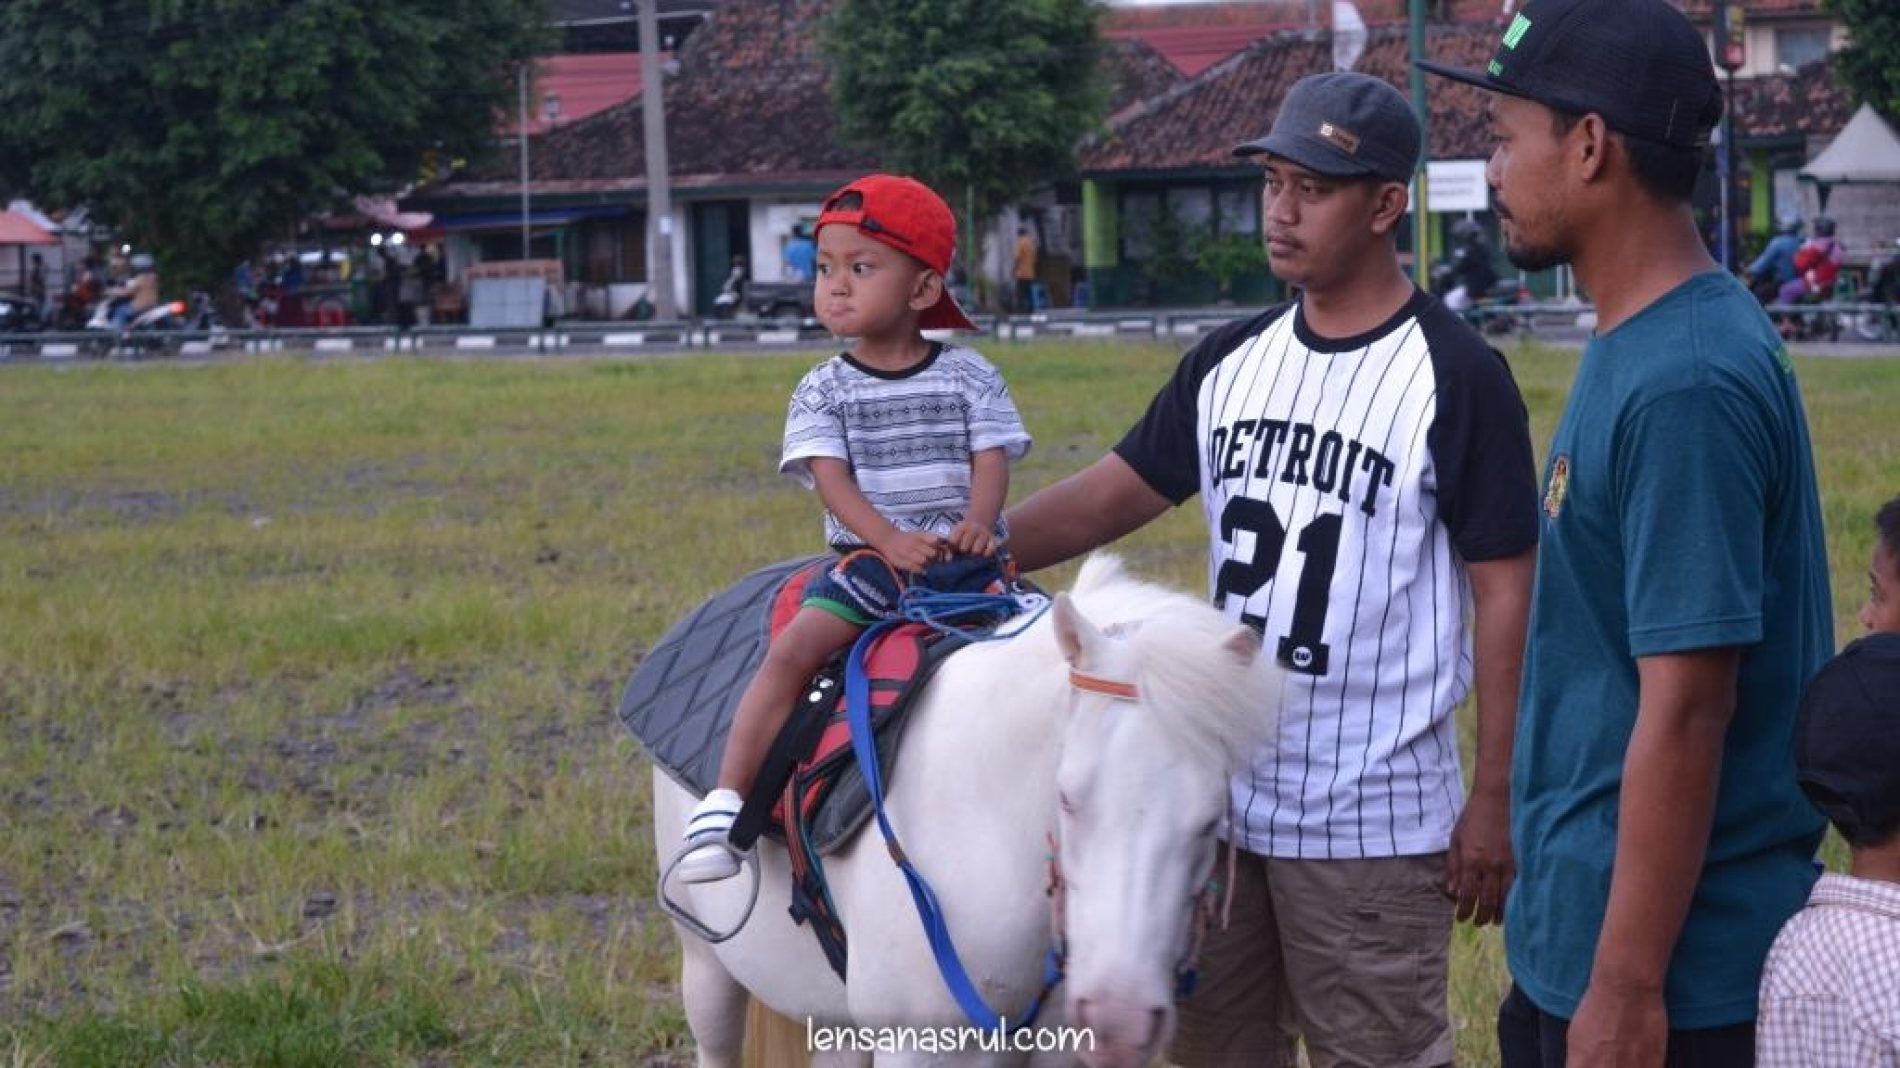 Wisata Berkuda di Alun Alun Utara Jogja